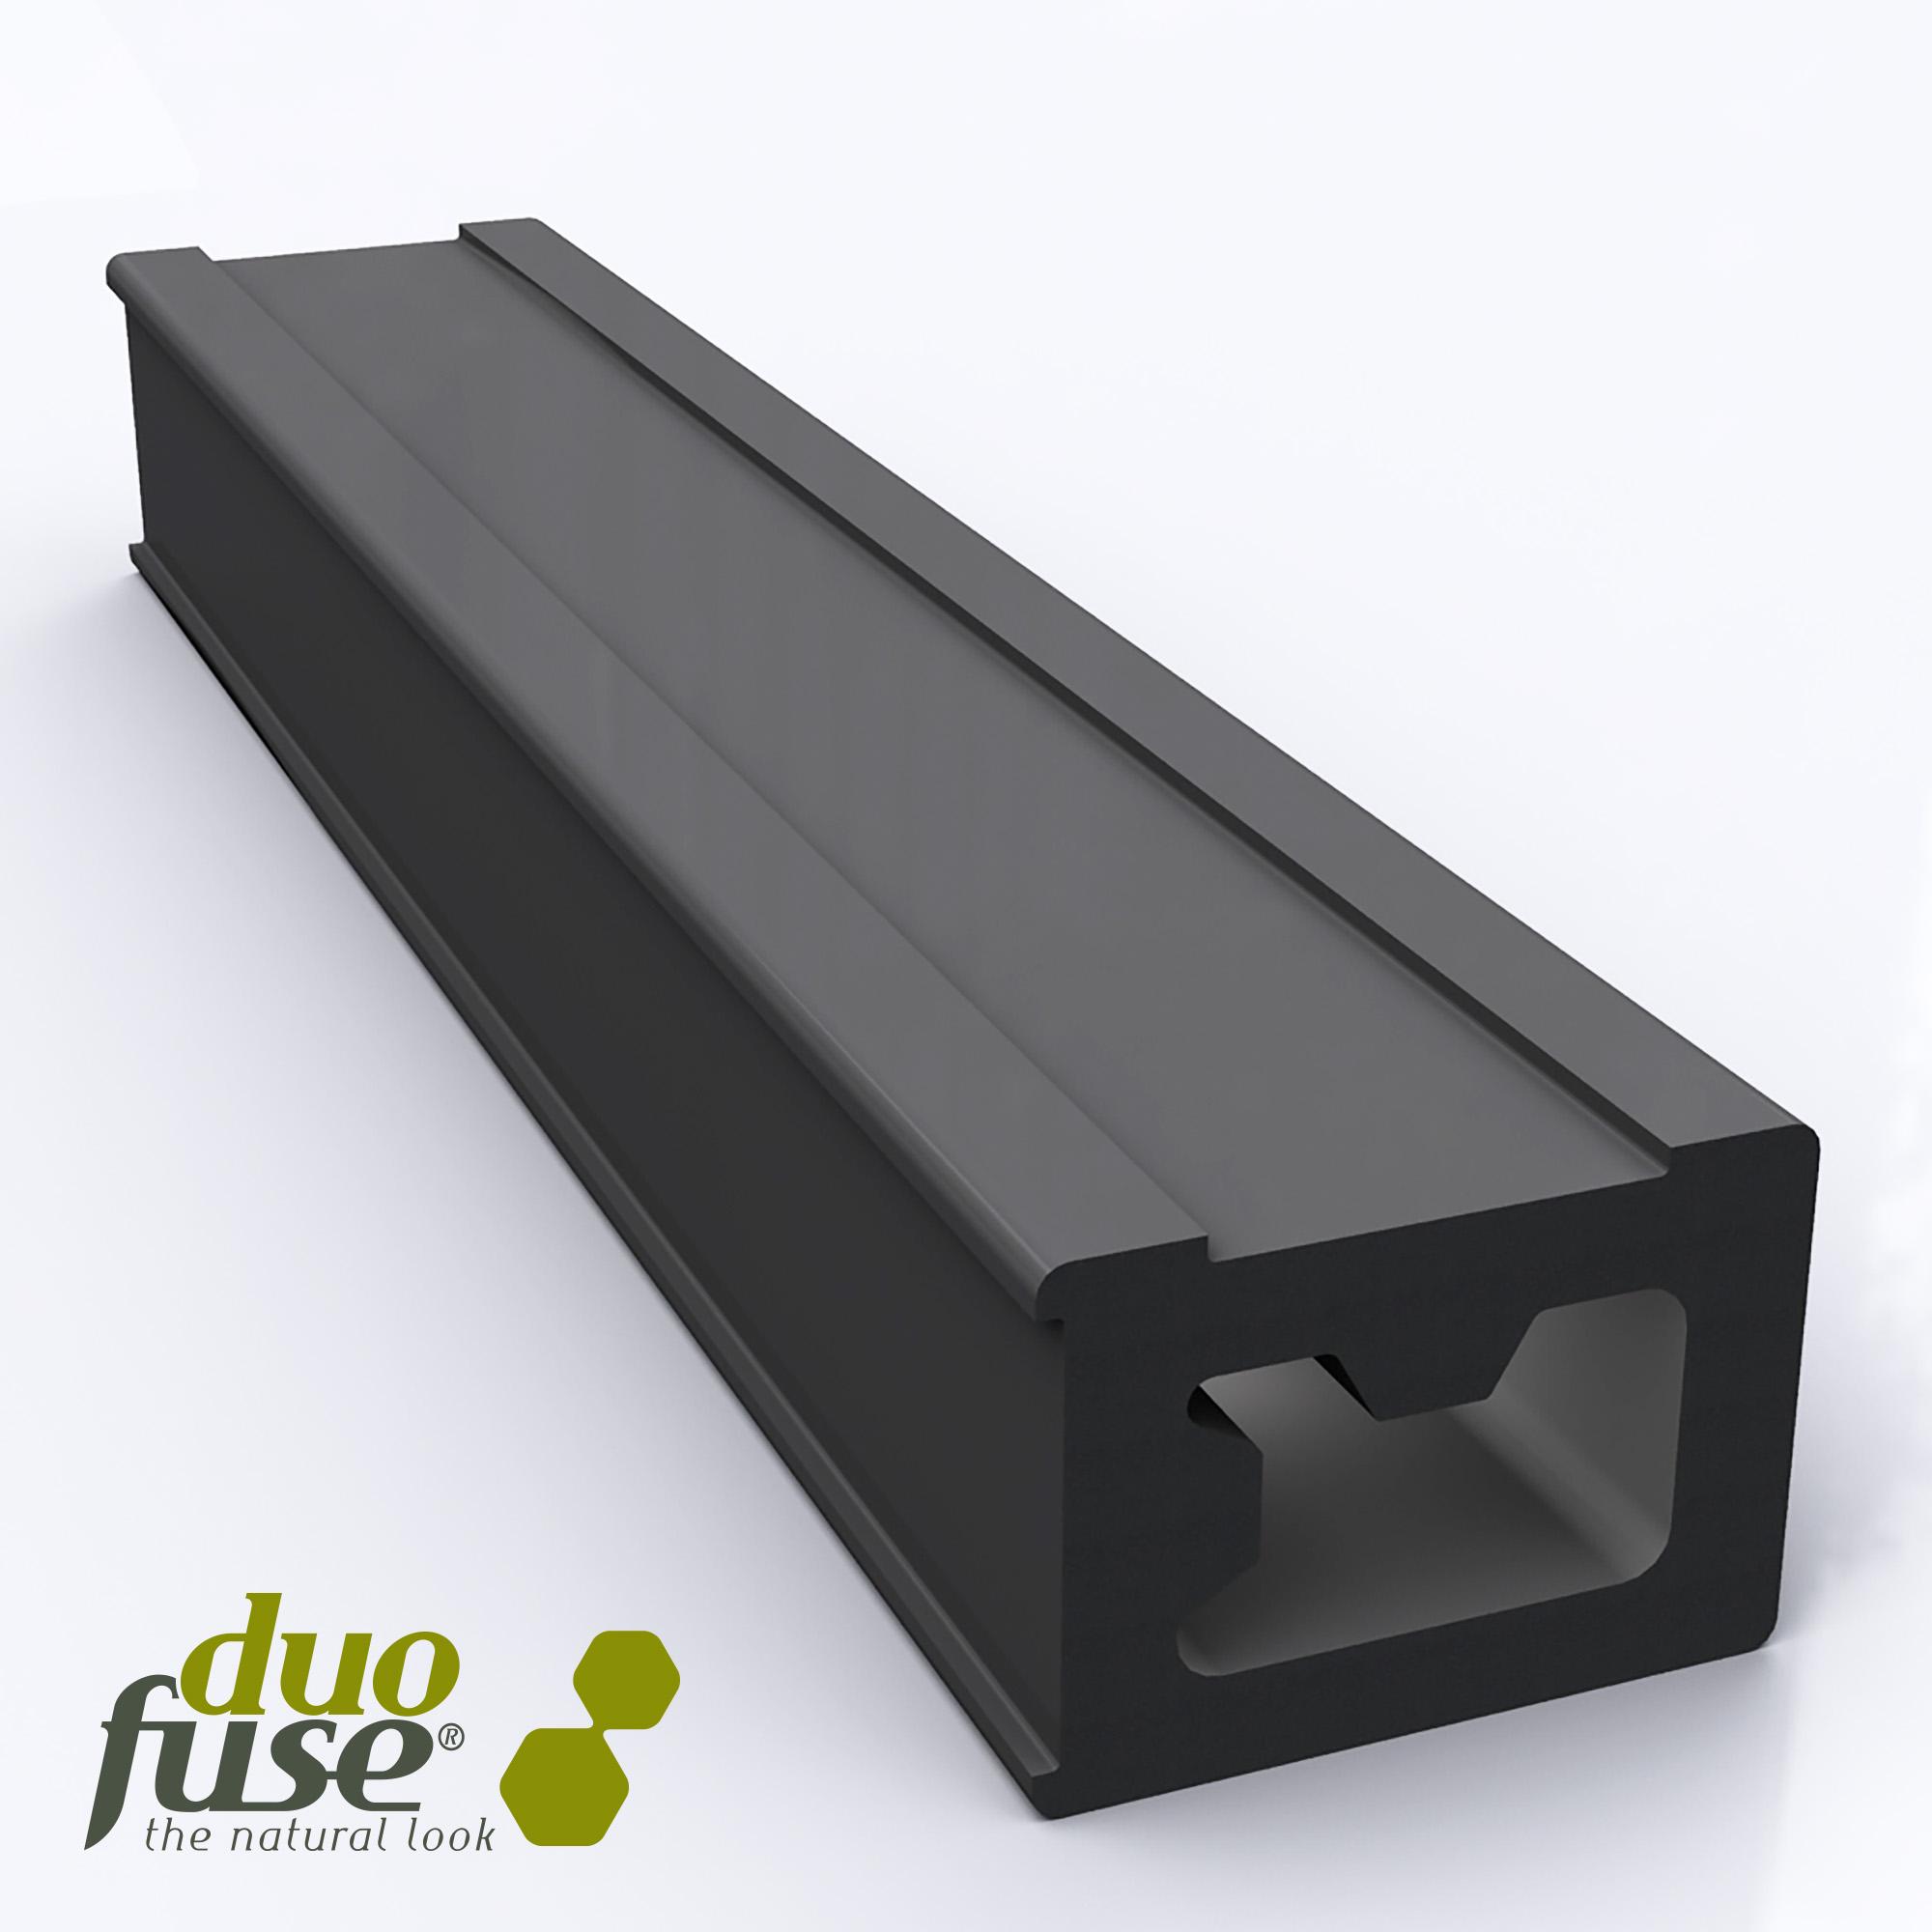 Duofuse | Onderregel | 35 x 48.5 mm | 400cm